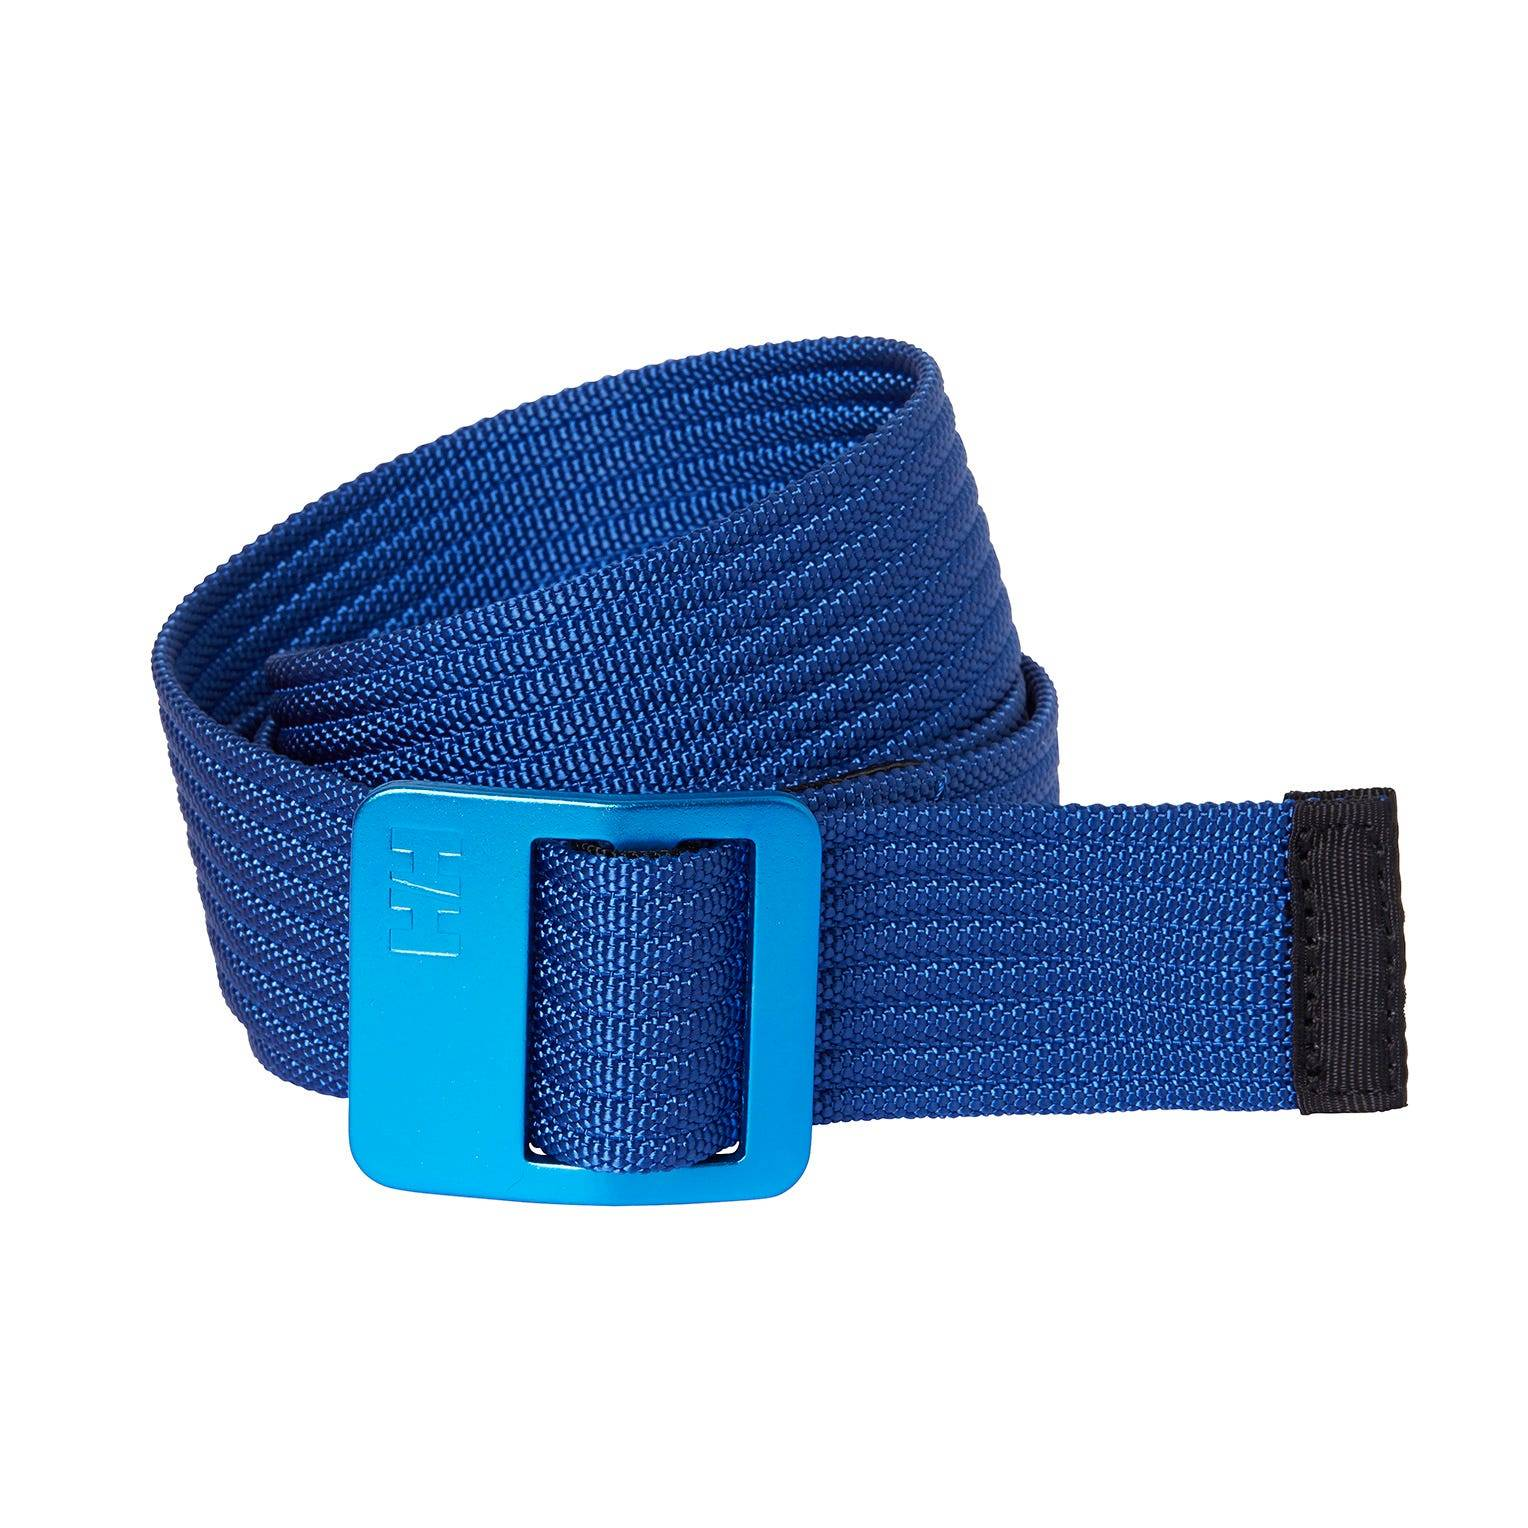 Helly Hansen Webbing Belt Blue 140